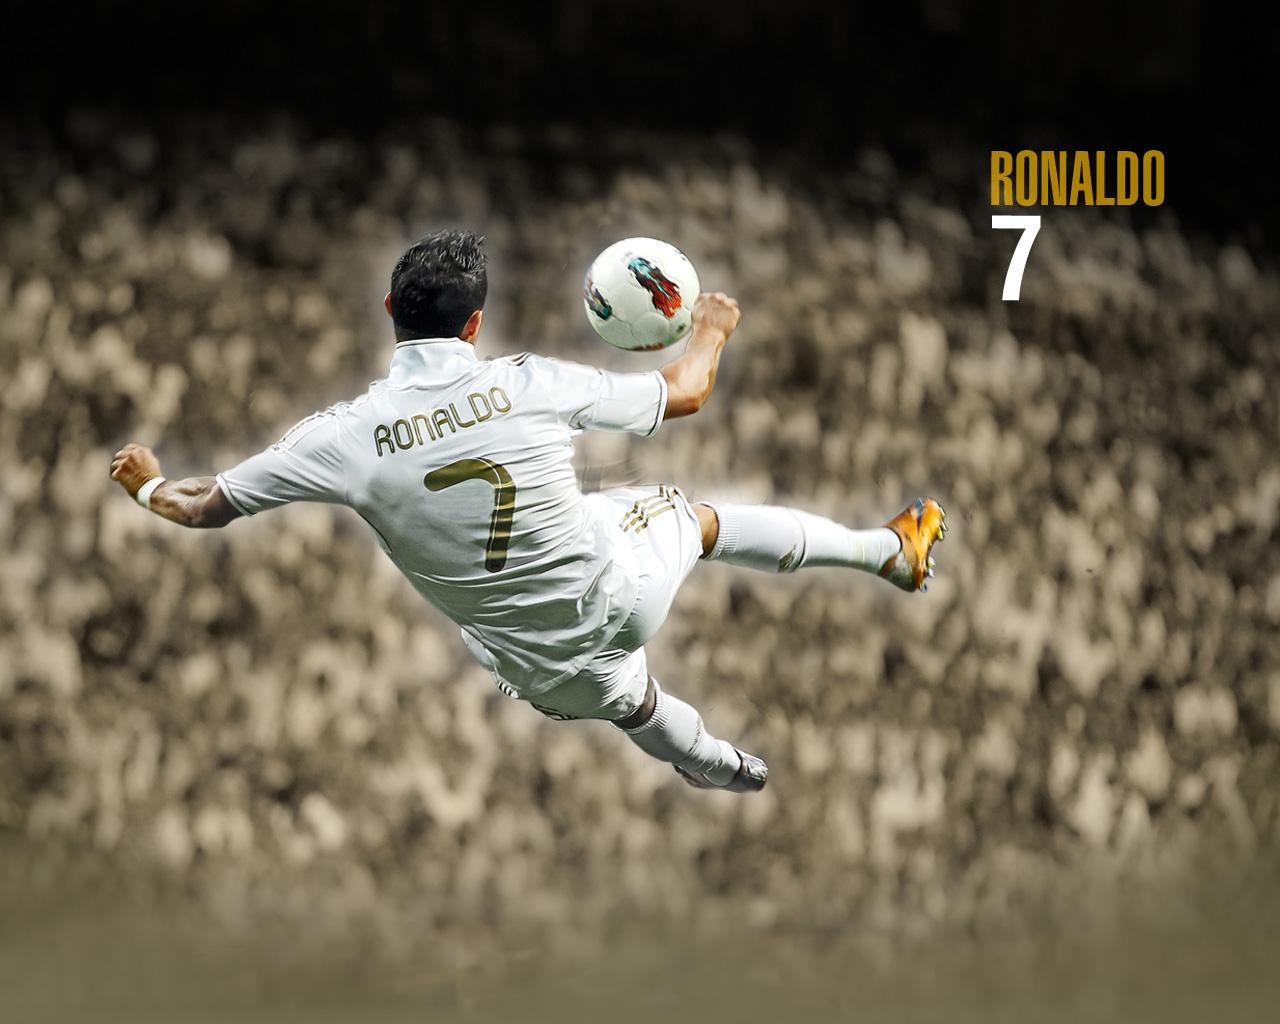 http://2.bp.blogspot.com/-BEklhsRfqHU/UOcXYF6O1oI/AAAAAAAAEQI/5xttXSh2Yms/s1600/Cristiano+Ronaldo+HD+Wallpapers+2012-2013+13.jpg